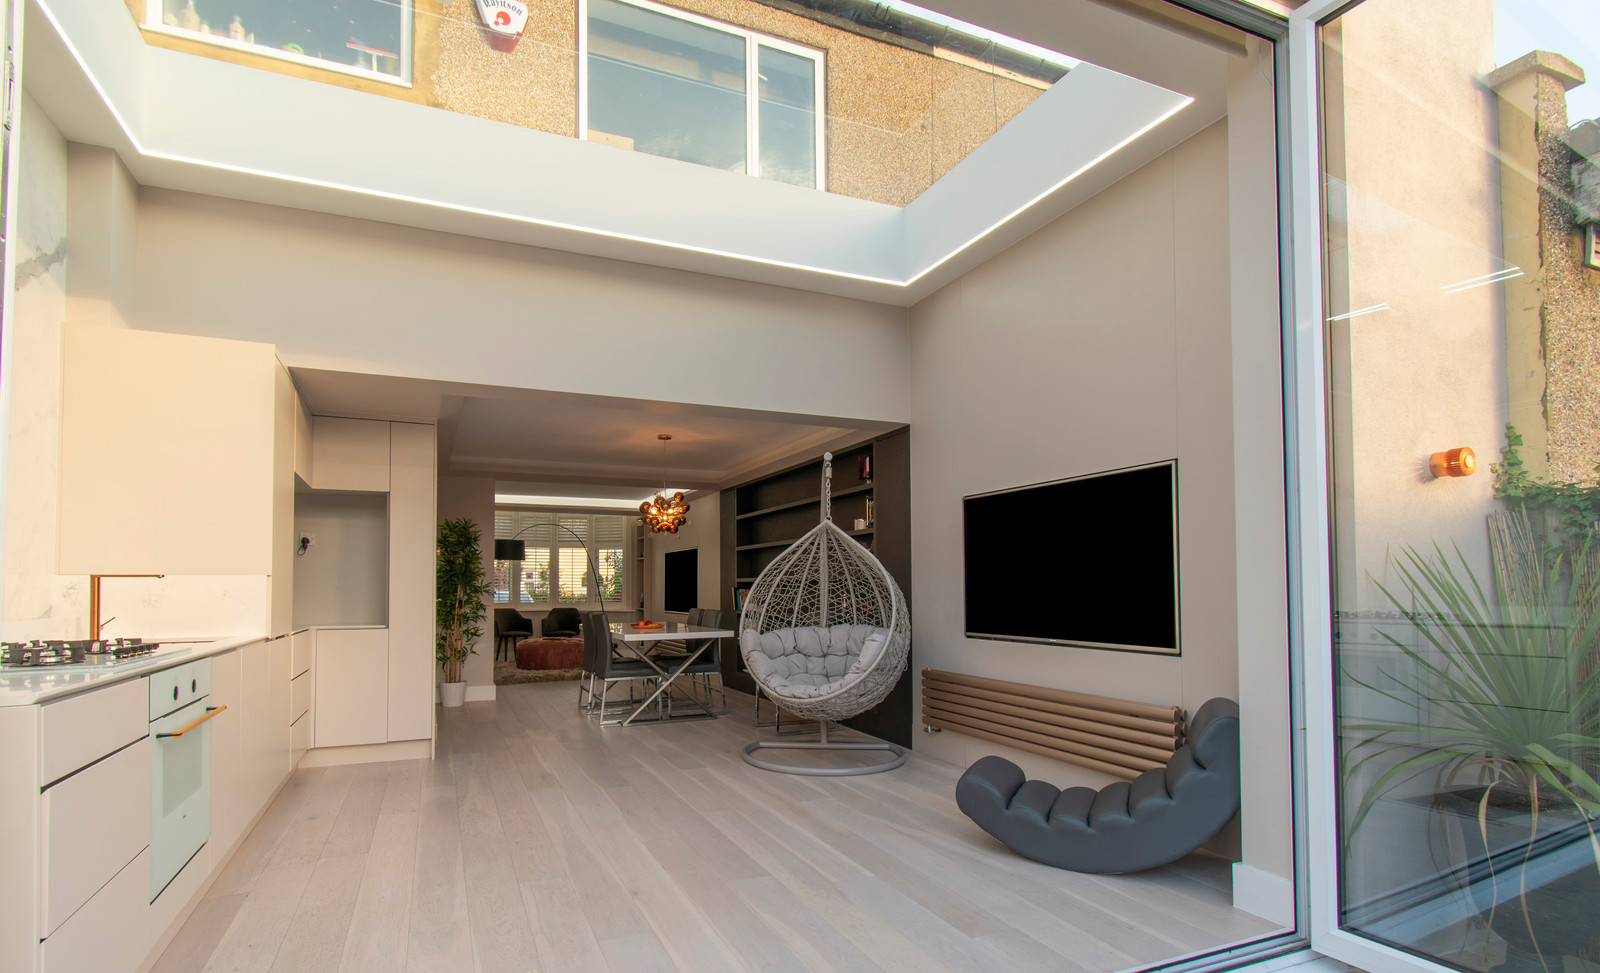 3 Metre Contemporary Luxury Kitchen Extension With Bespoke Kitchen